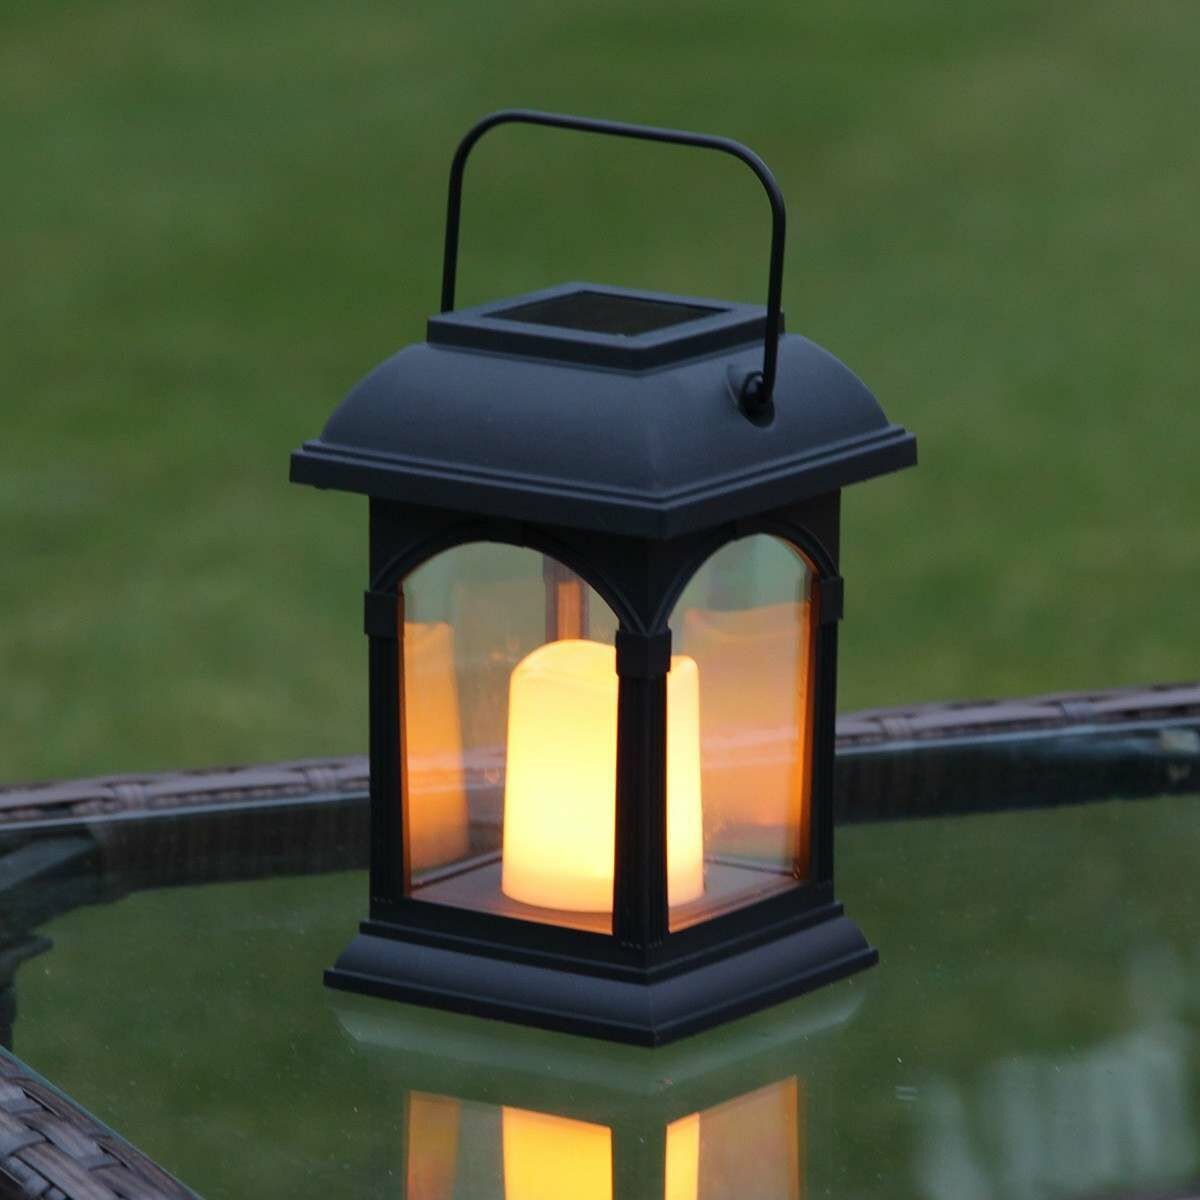 Amber Solar Powered Festive Lights Garden Candle Lantern Flickering Effect